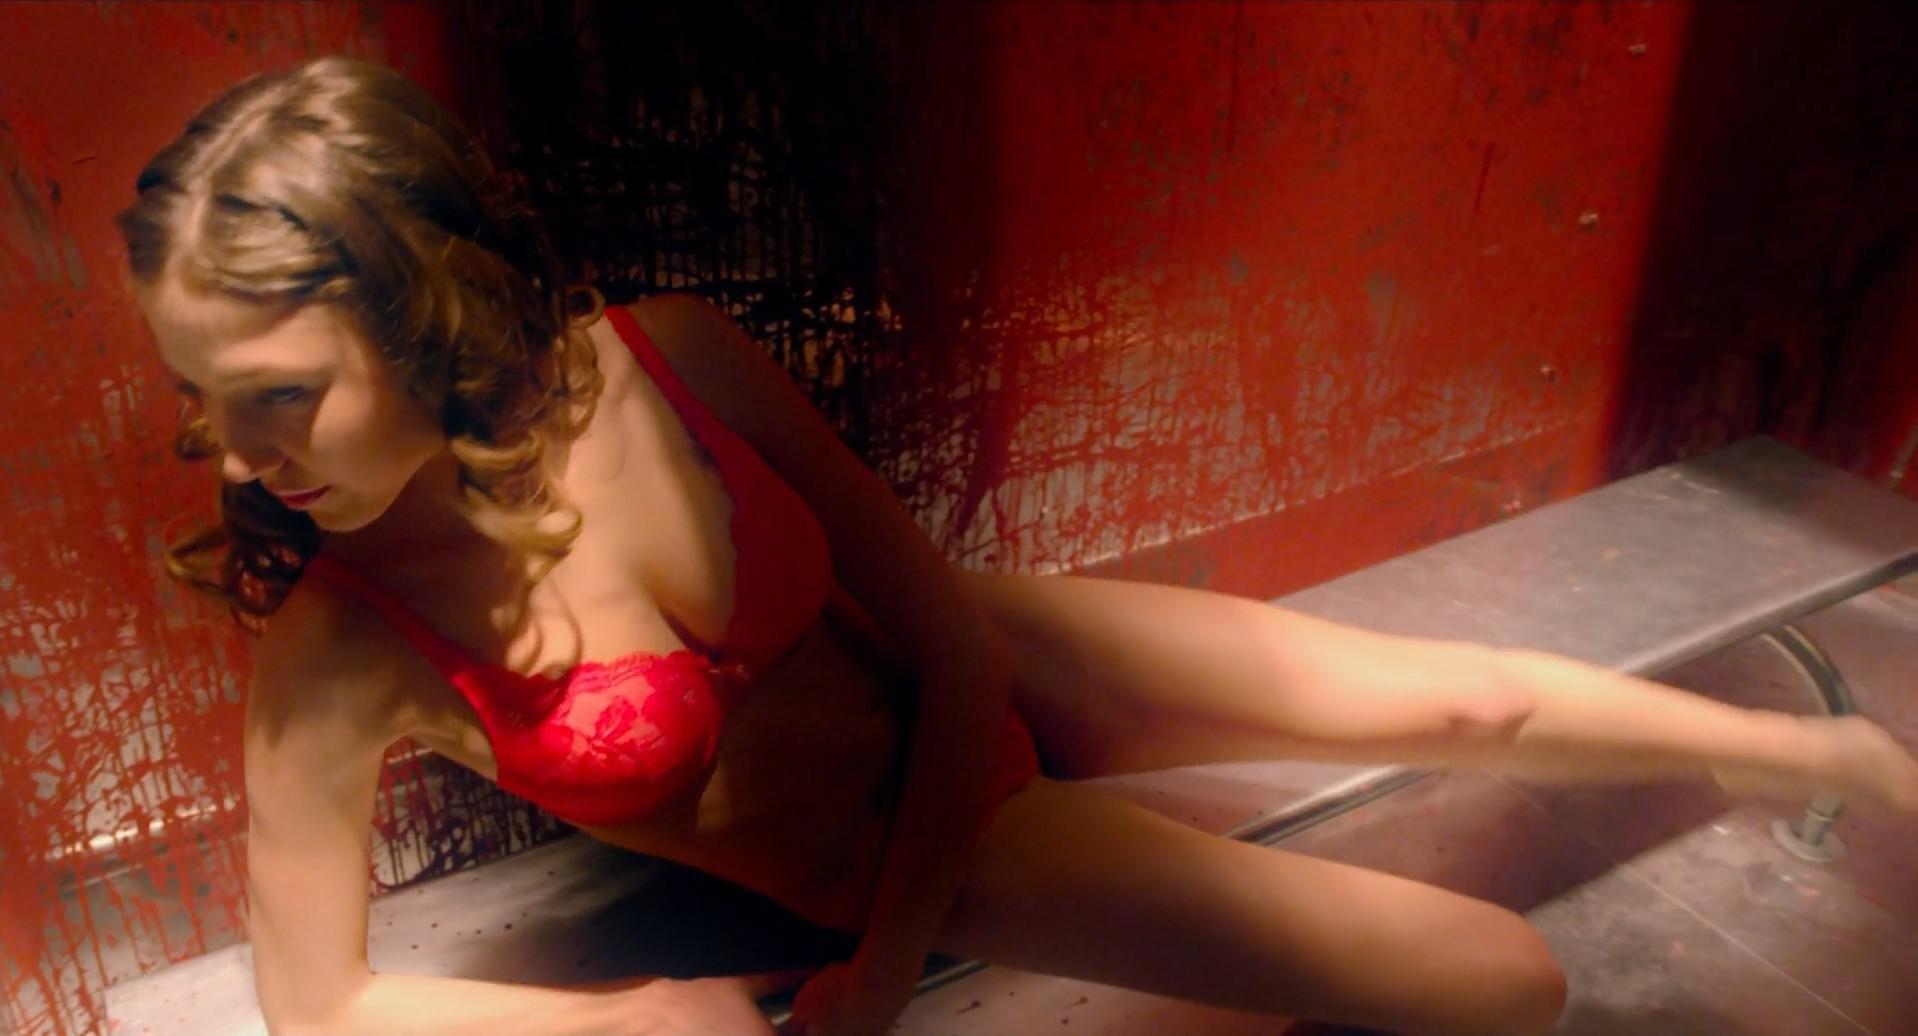 Authoritative point Daniela silverio nude And